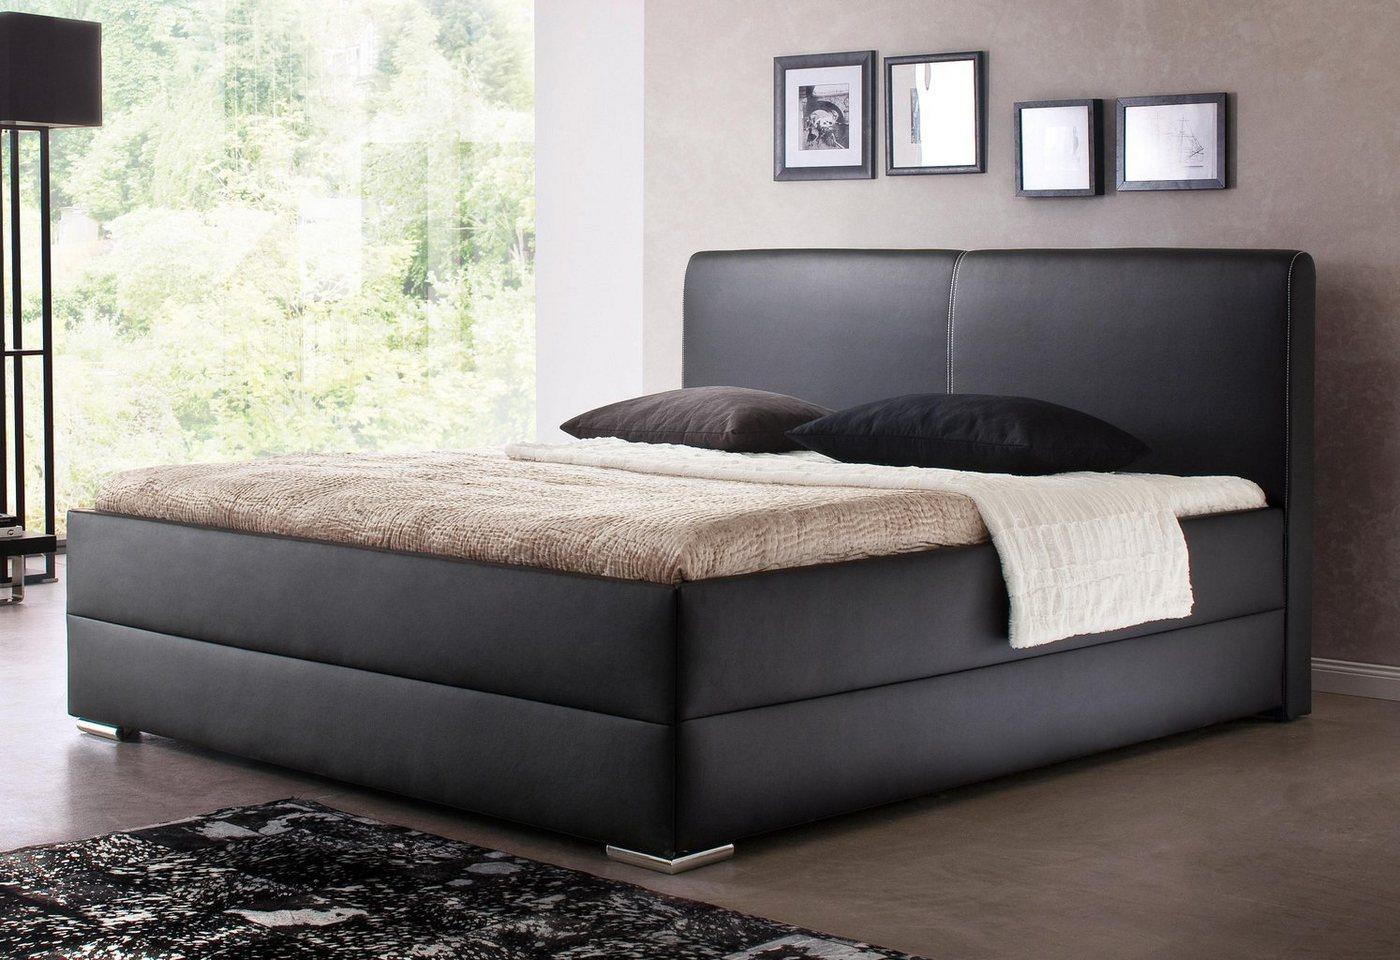 polsterbetten komforth he preisvergleiche. Black Bedroom Furniture Sets. Home Design Ideas